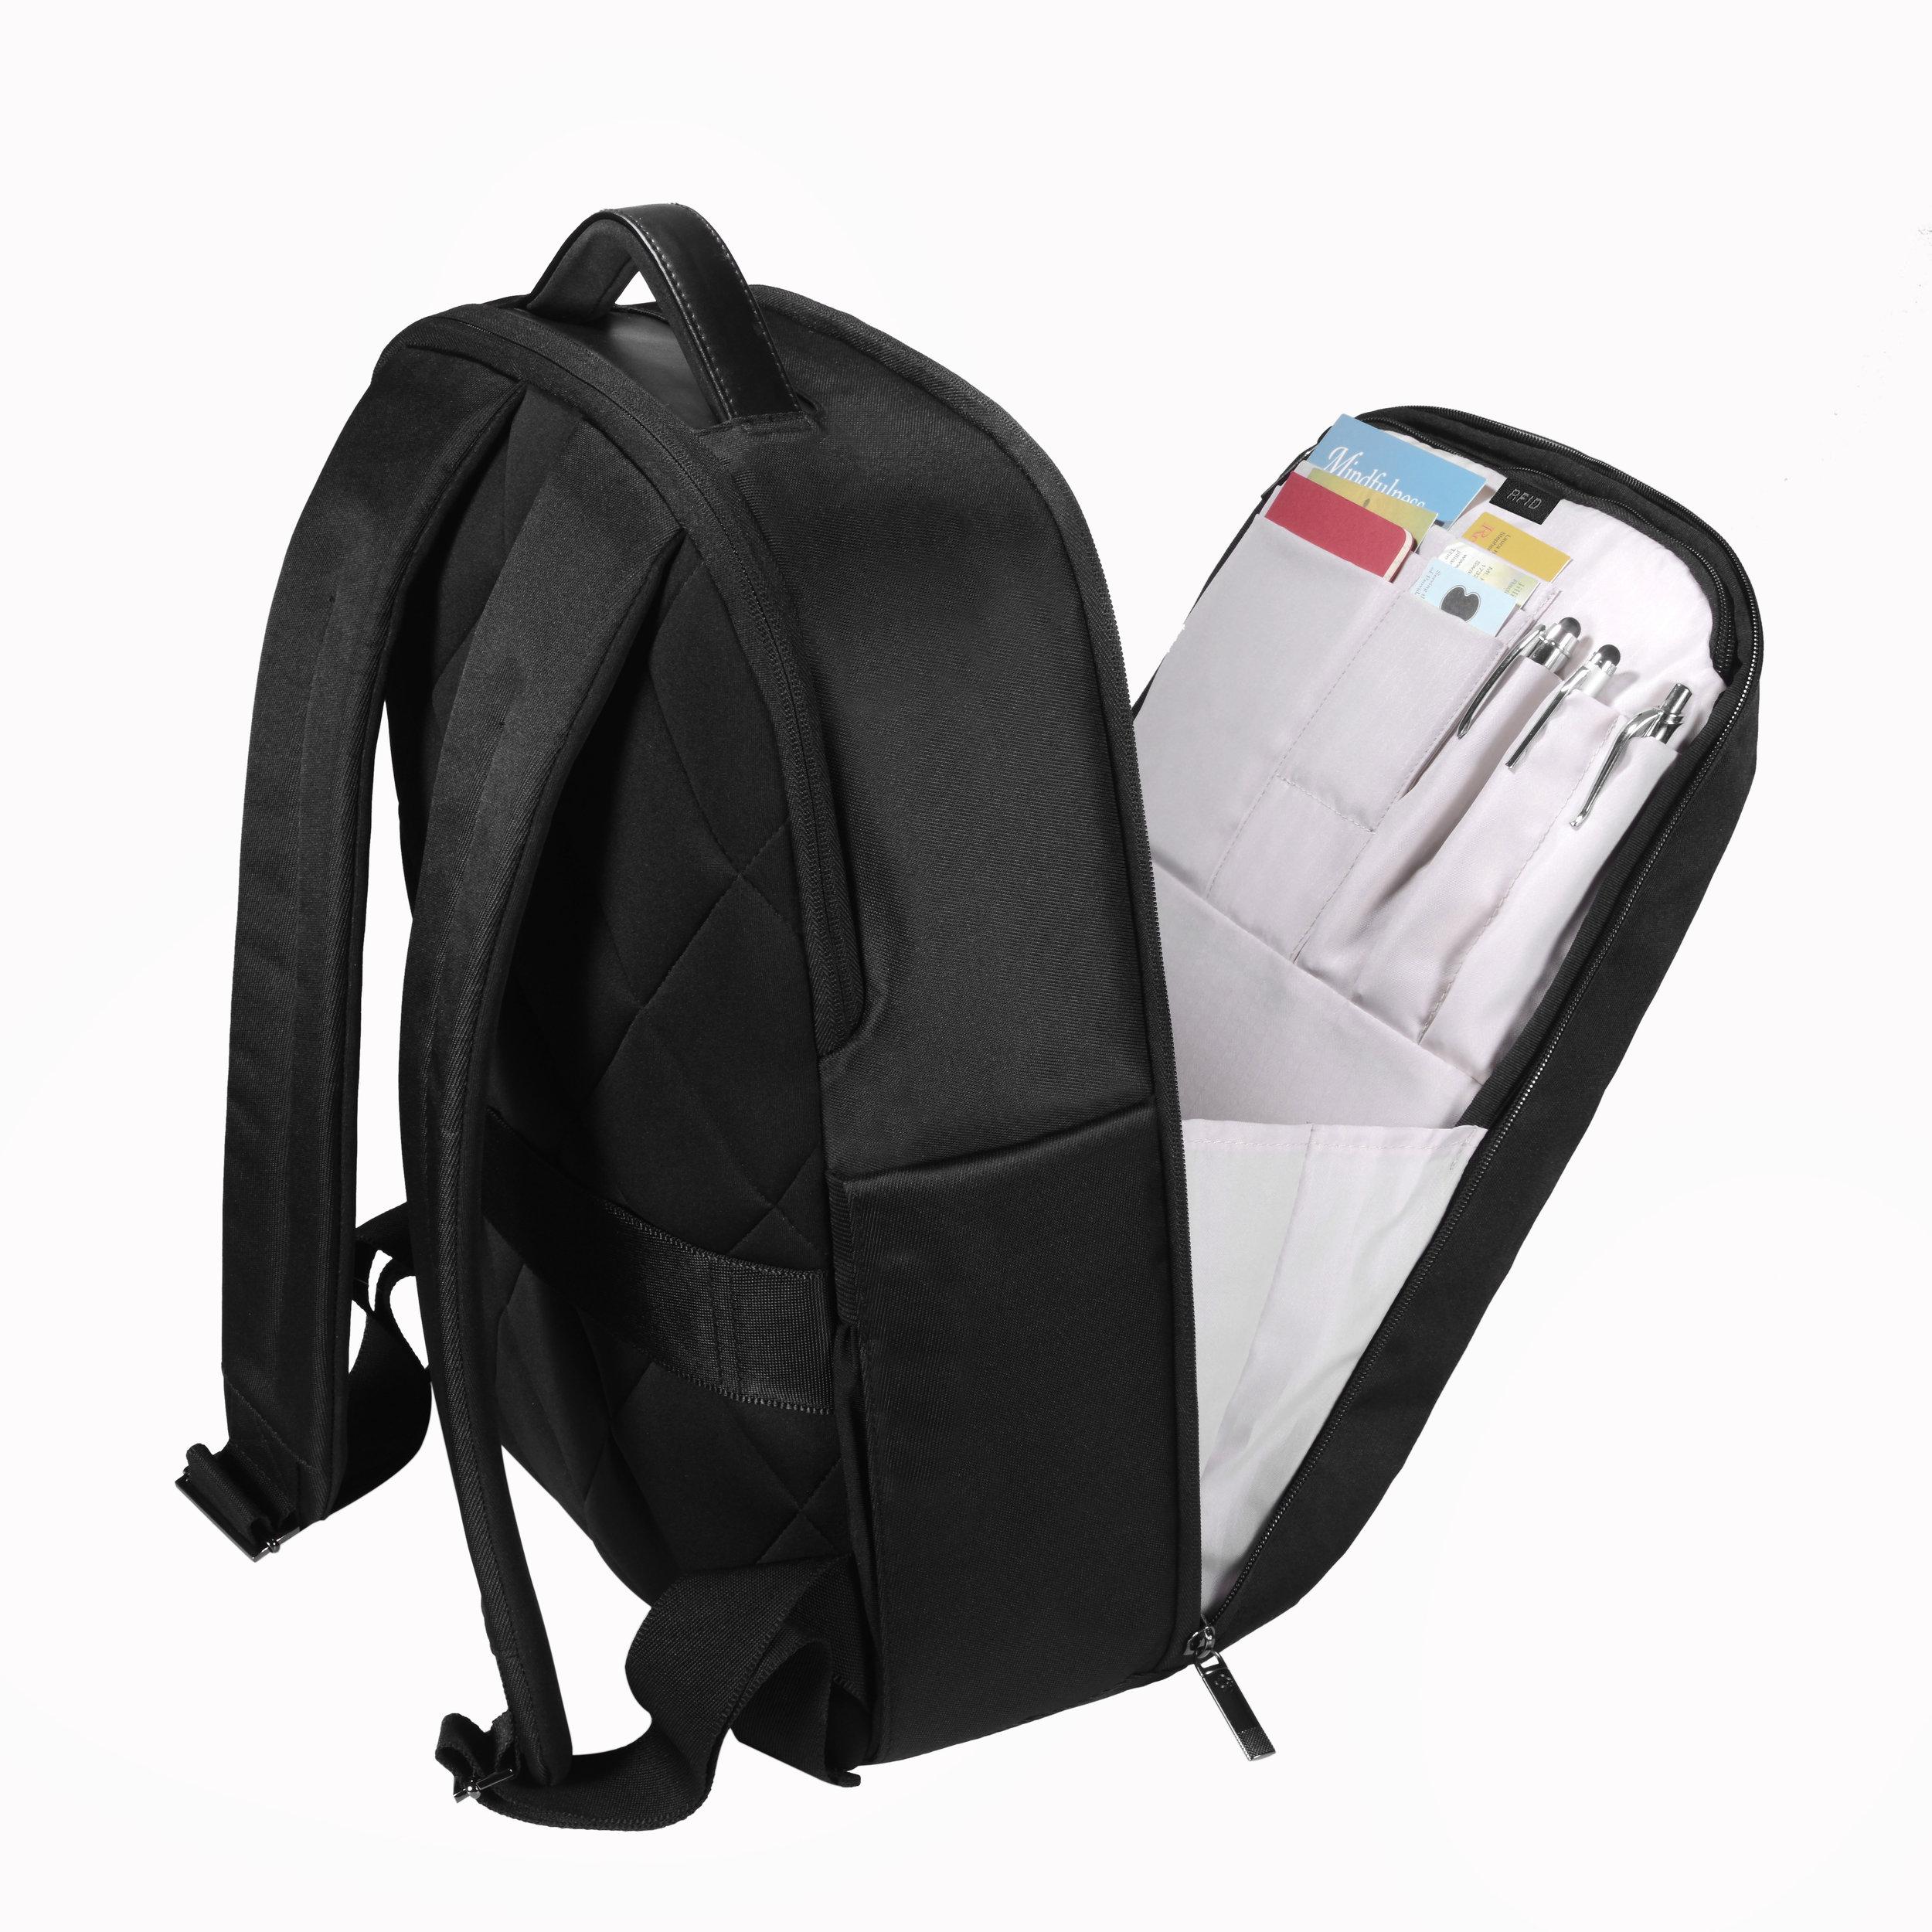 Sleek, soft seamed organizational pockets.